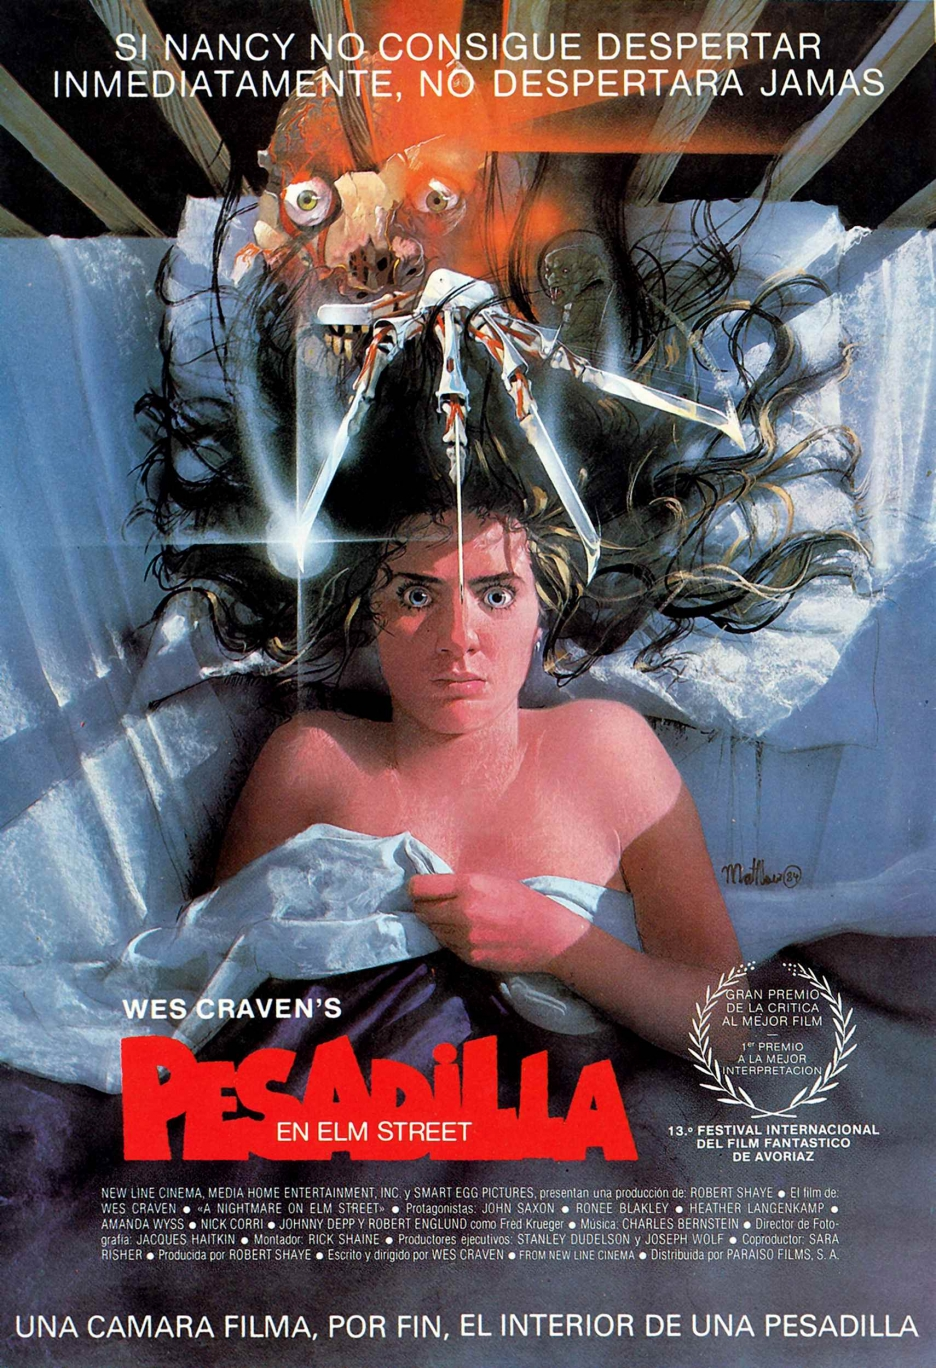 movie 1984 sociology